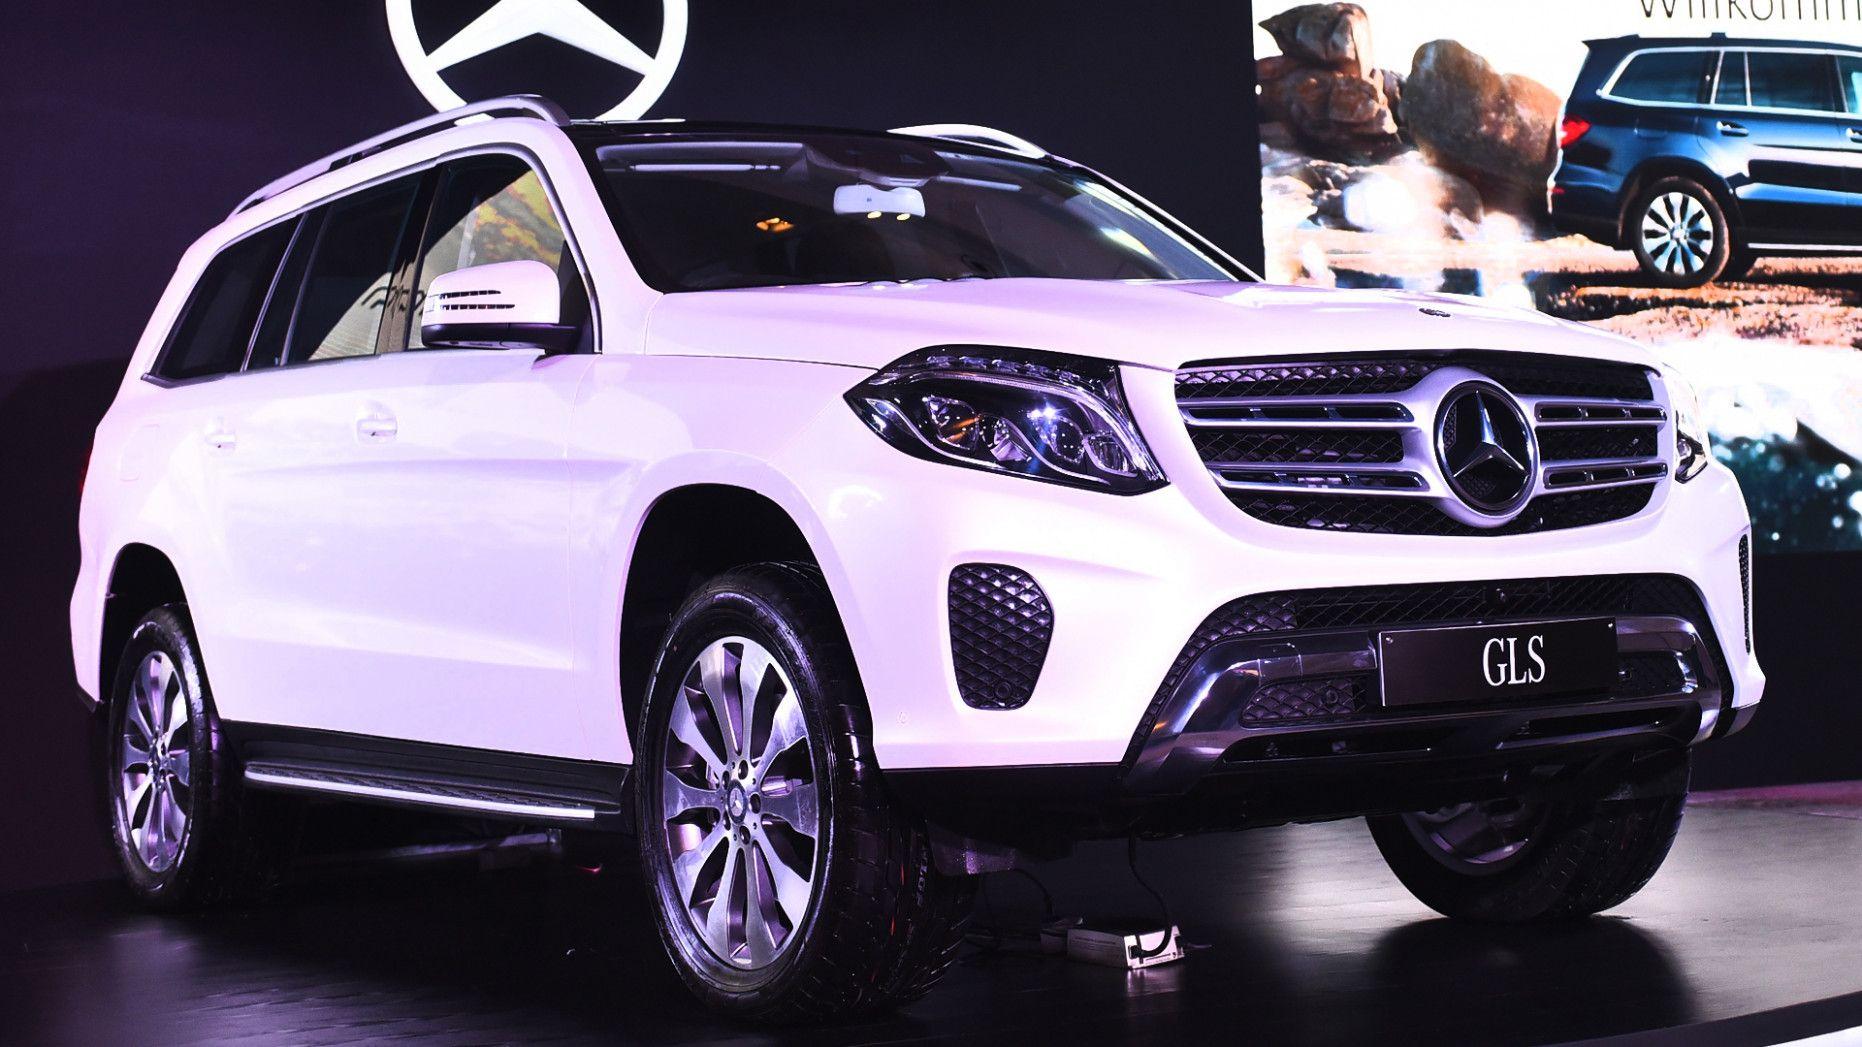 8 Image Mercedes India Price 2020 in 2020 Mercedes car